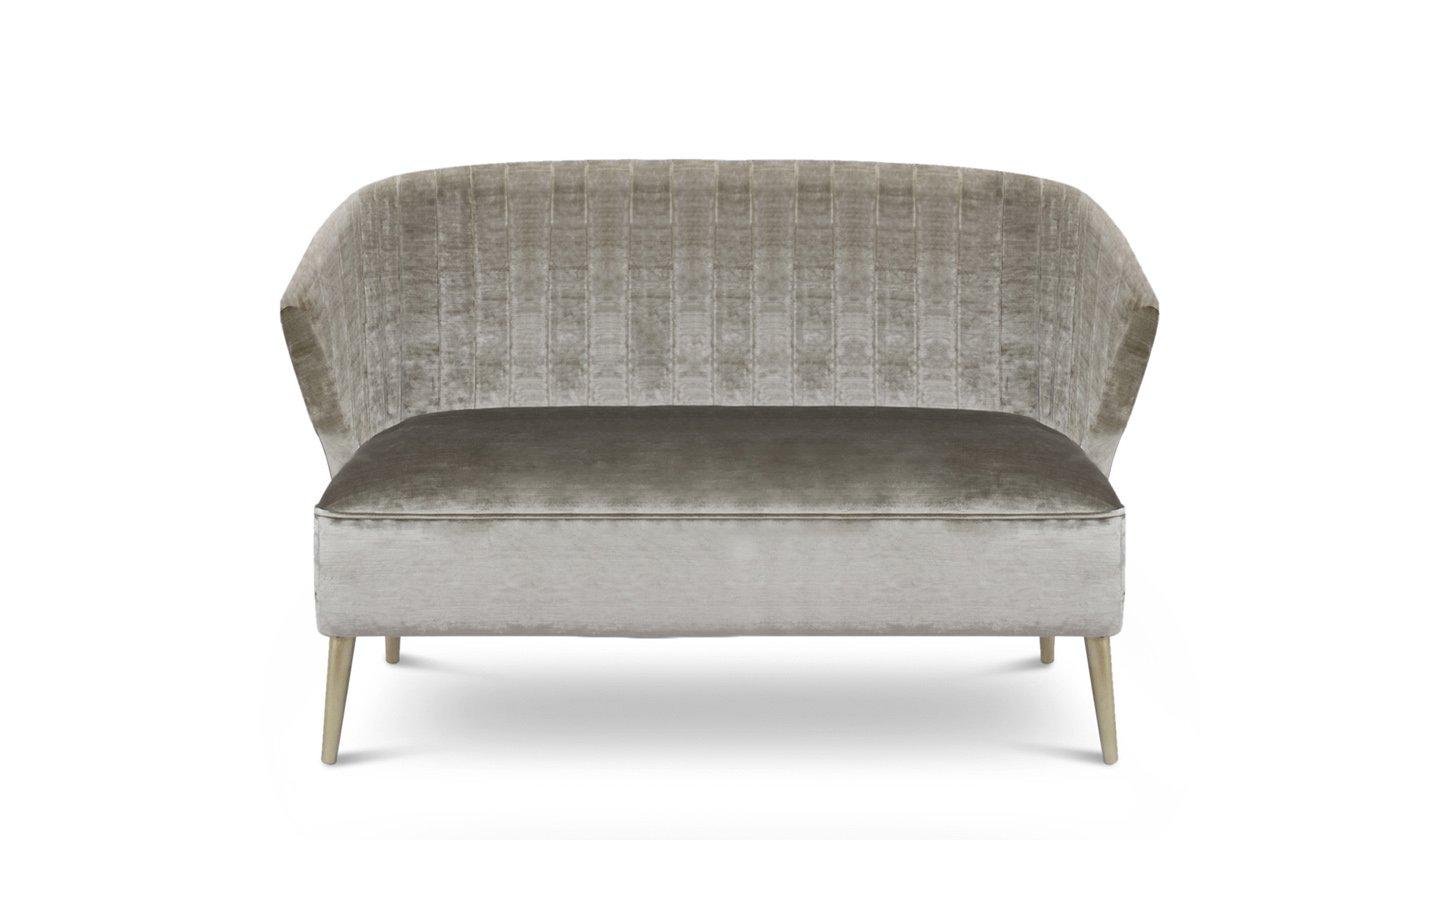 Nuka sofa two seater – light grey